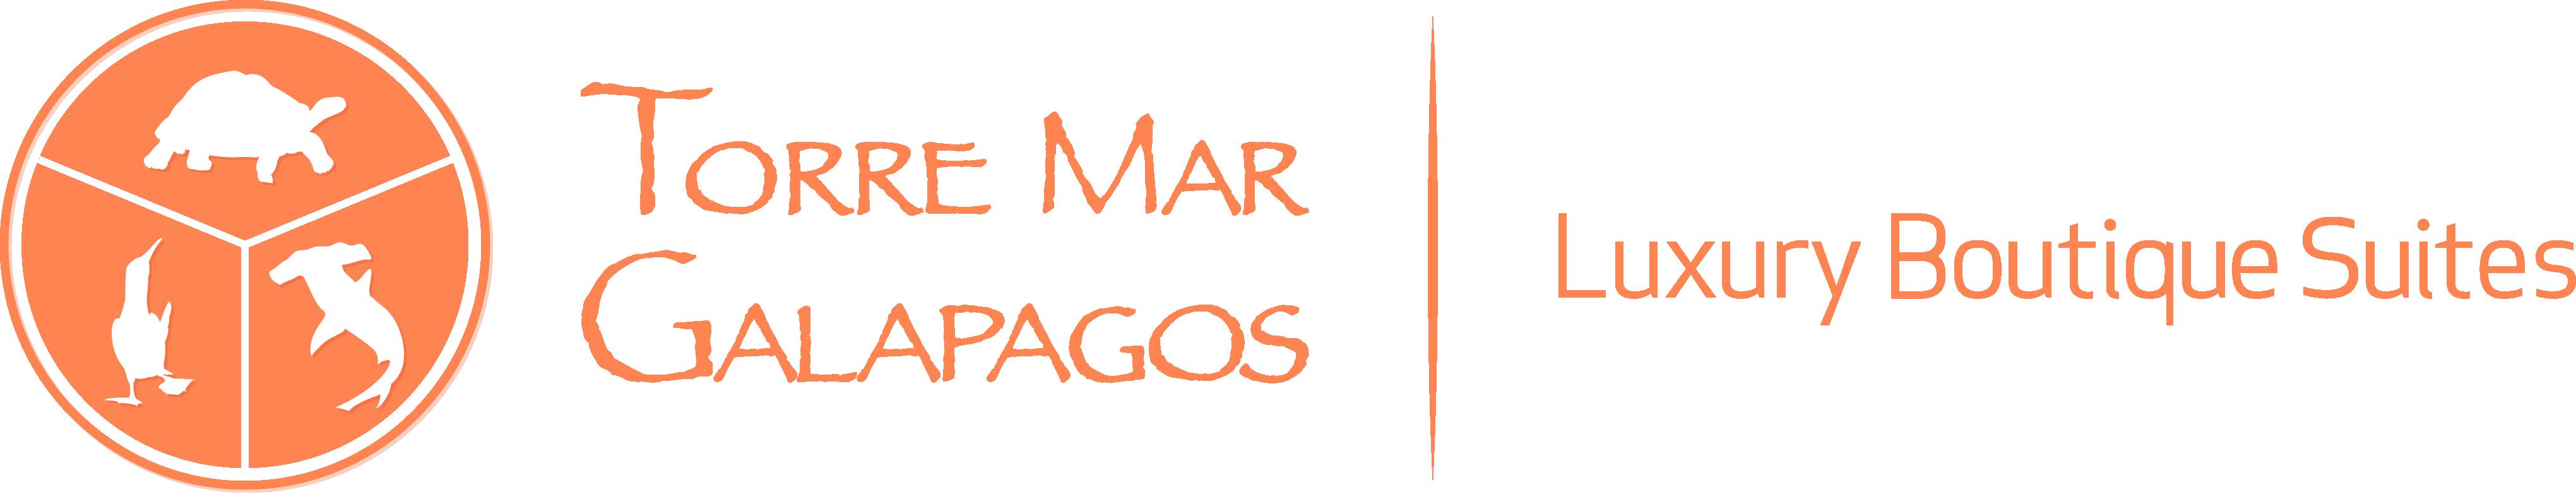 Torre Mar Galapagos